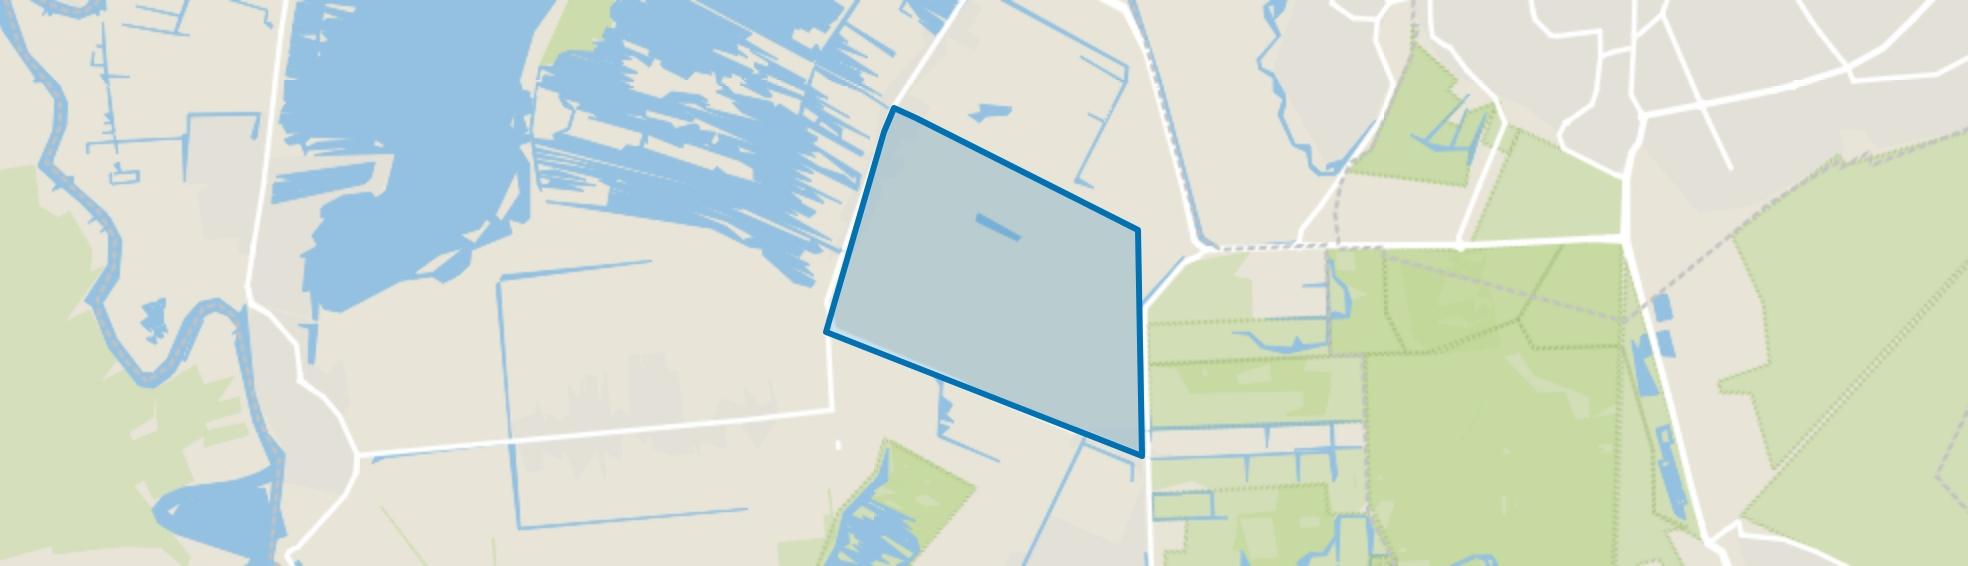 Ankeveense Rade, Ankeveen map